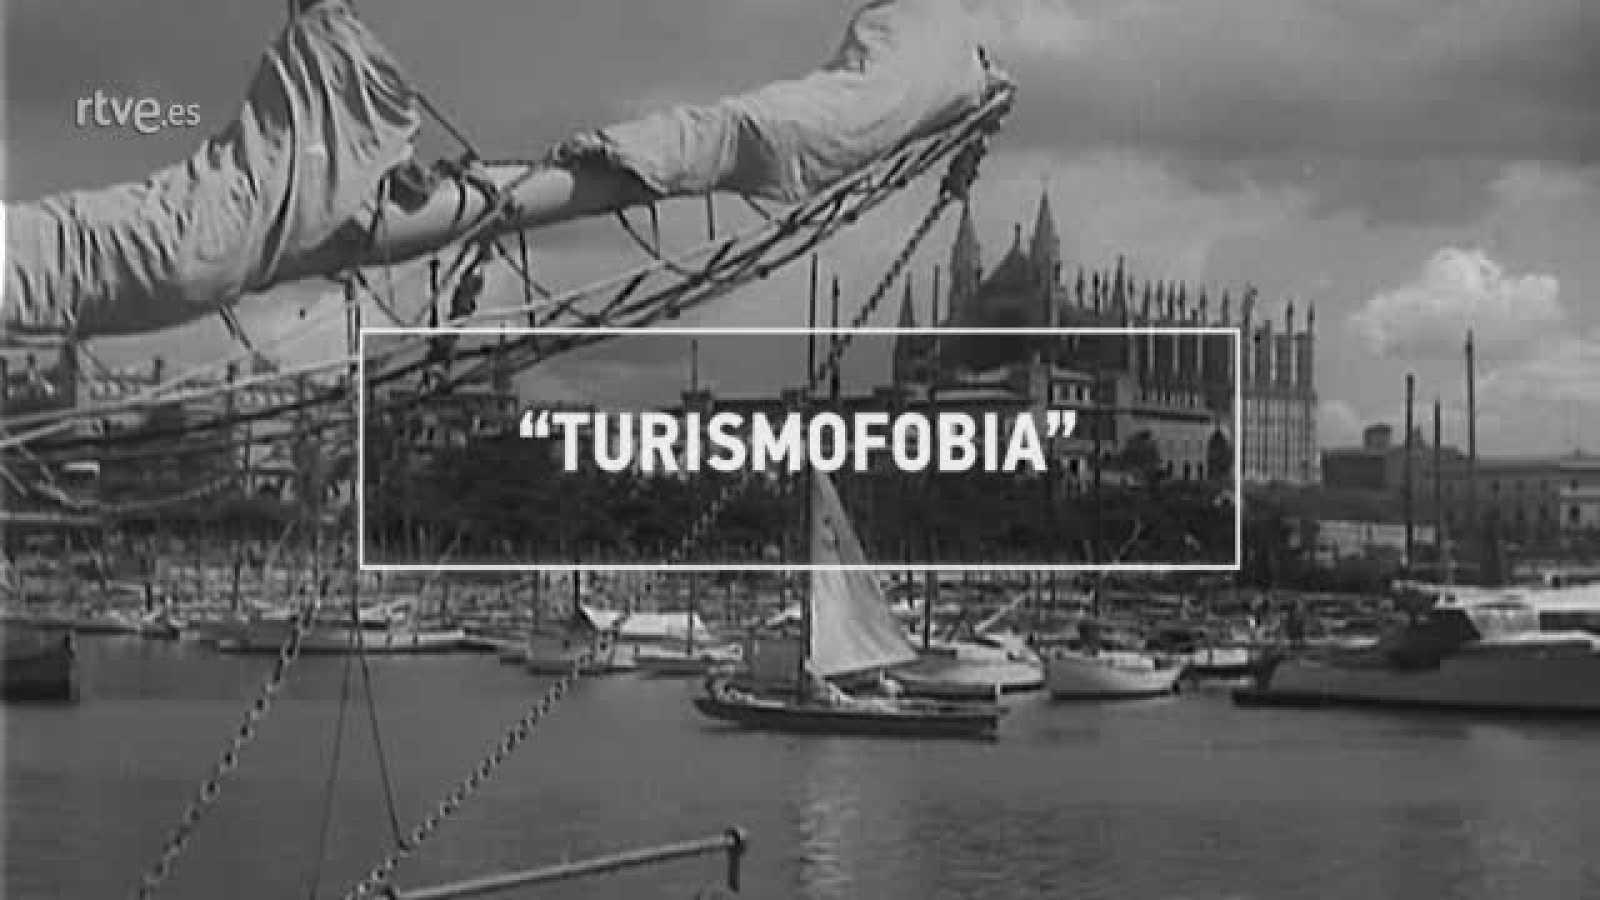 ¿Te acuerdas? - Turismofobia -  Ver ahora